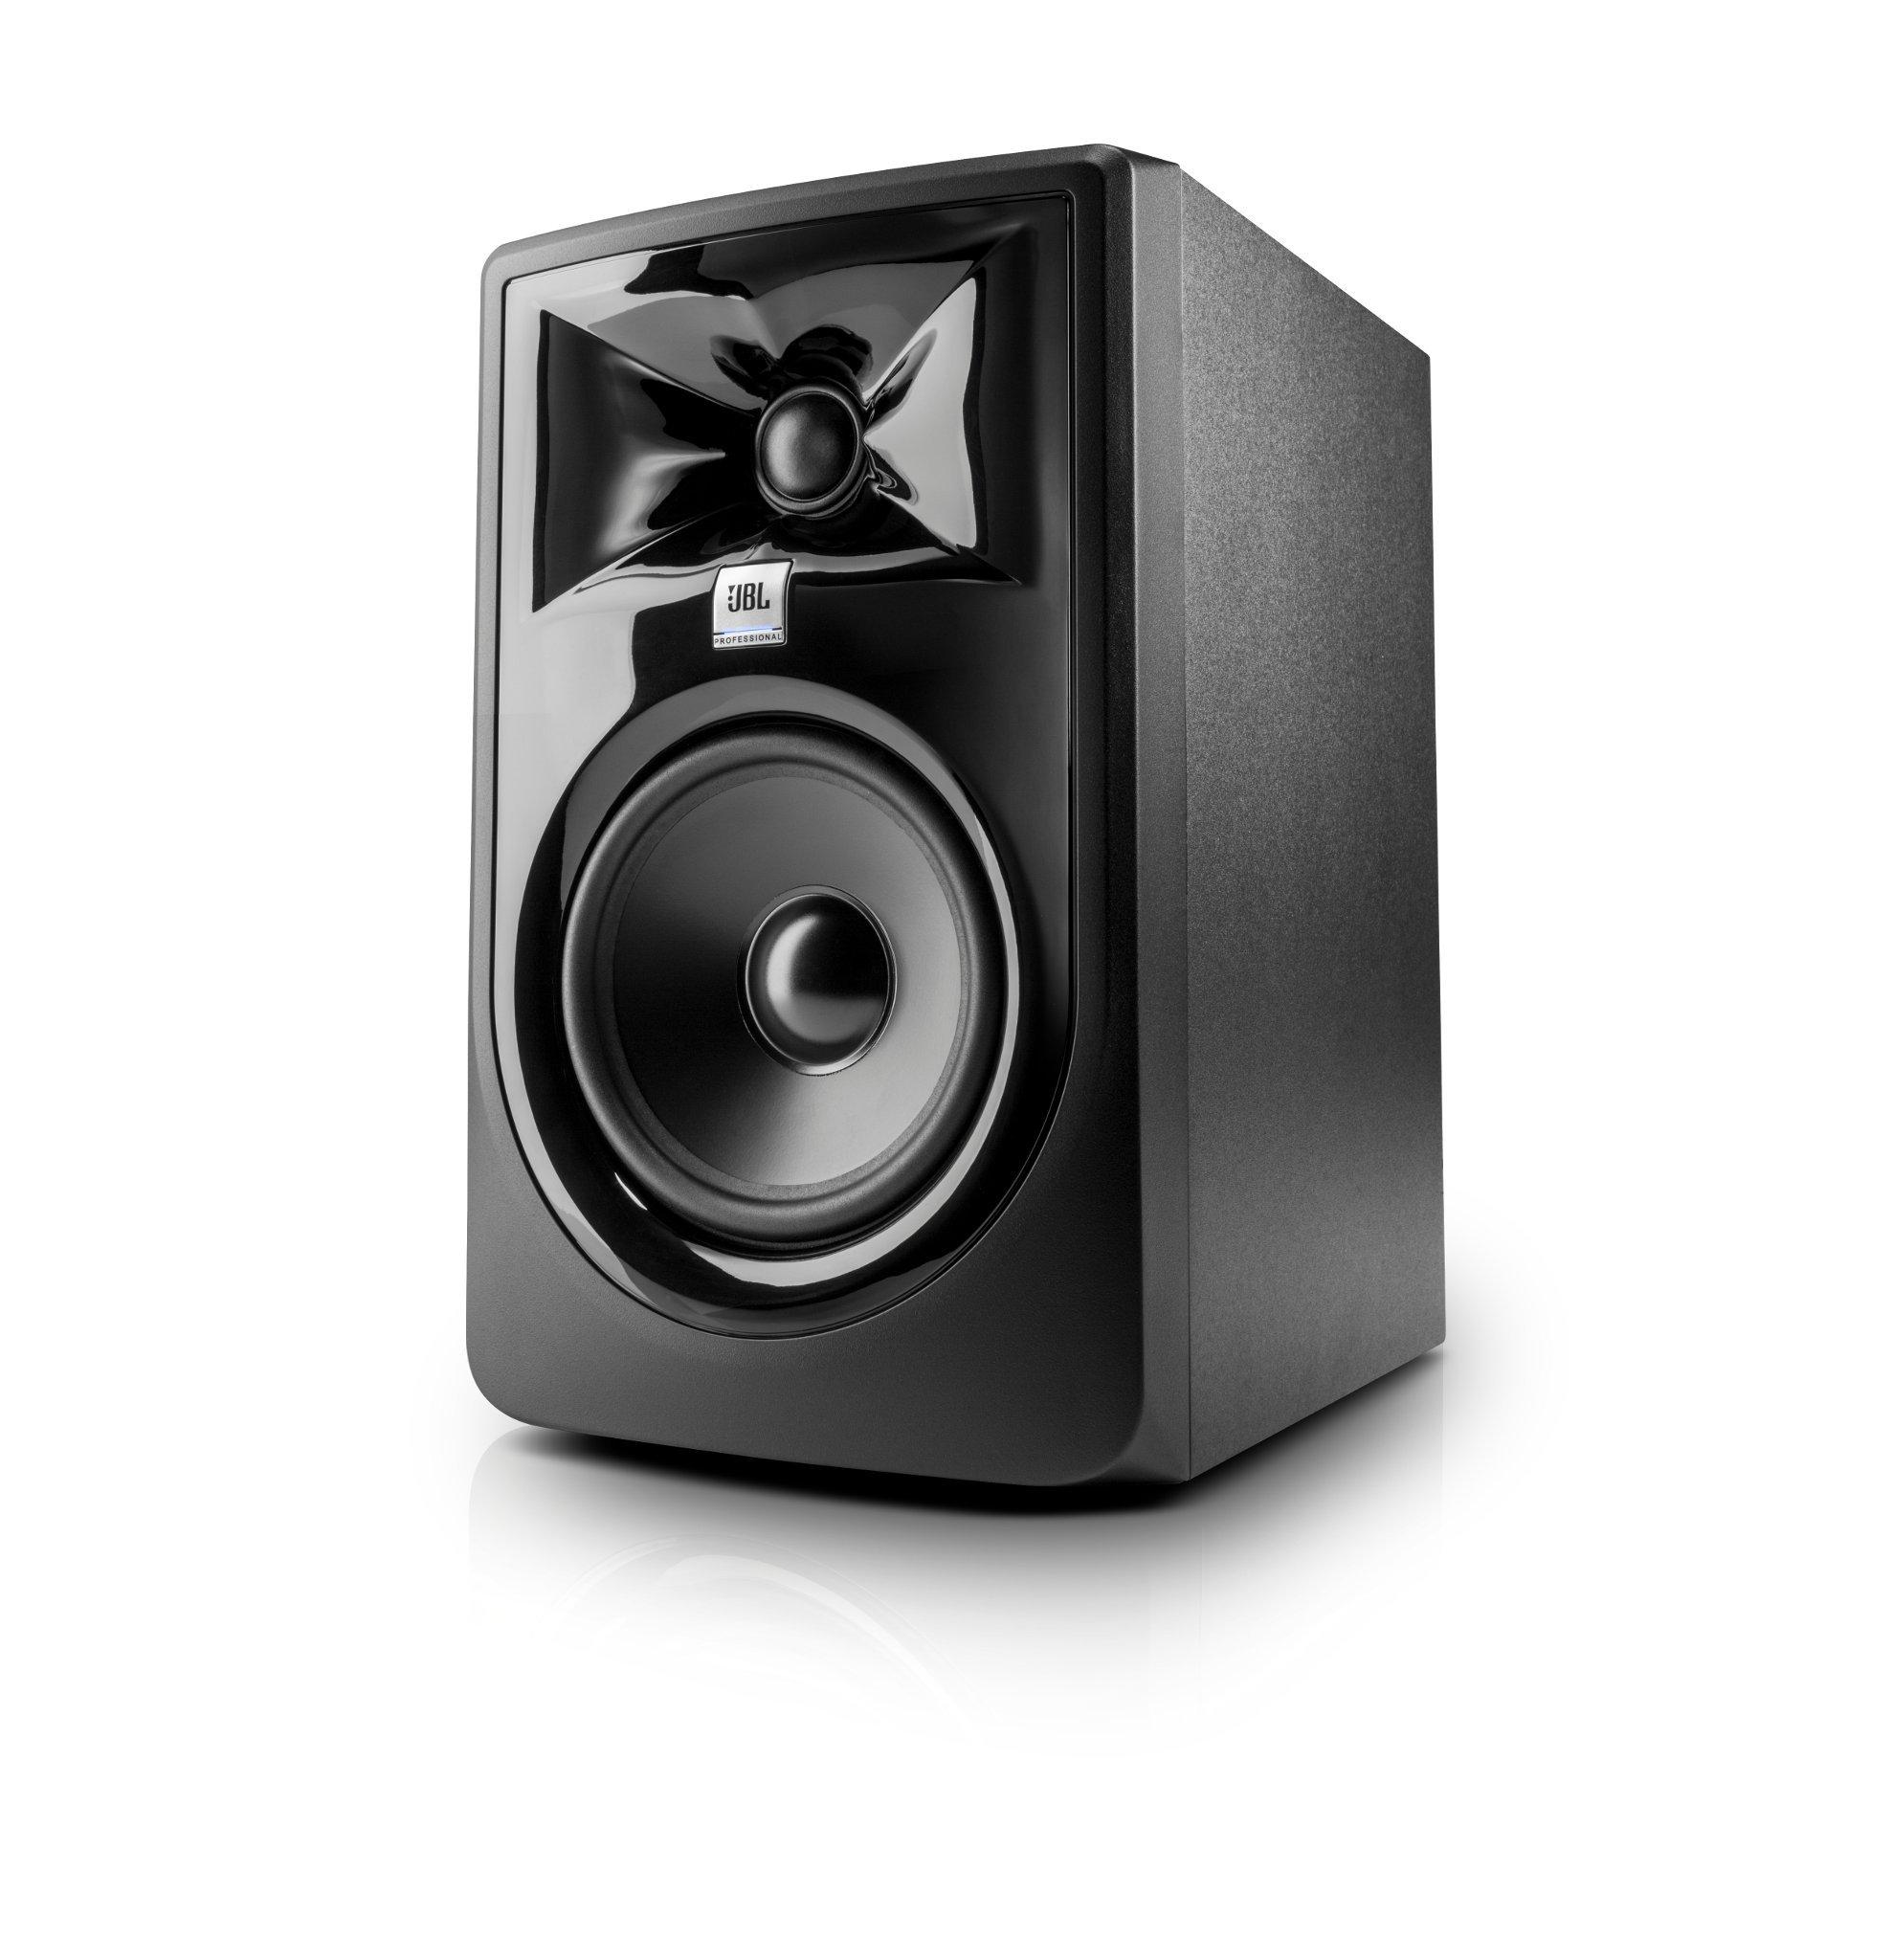 JBL Professional 305P MkII 5'' 2-Way Powered Studio Monitor (new model) - 305PMKII